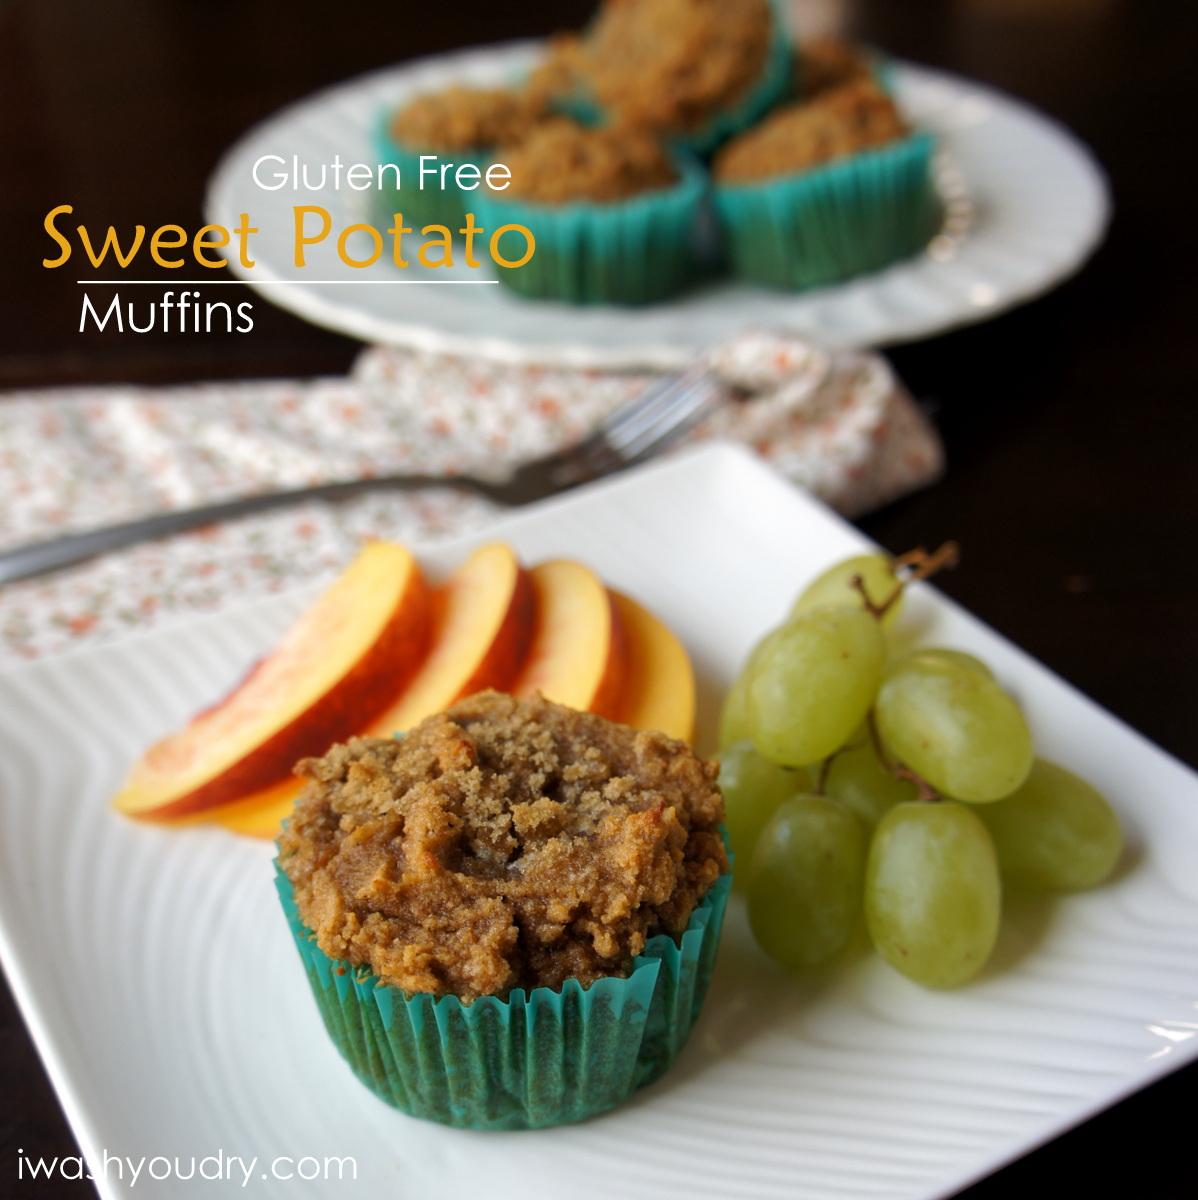 Gluten Free Sweet Potato Muffins (using Coconut Flour)